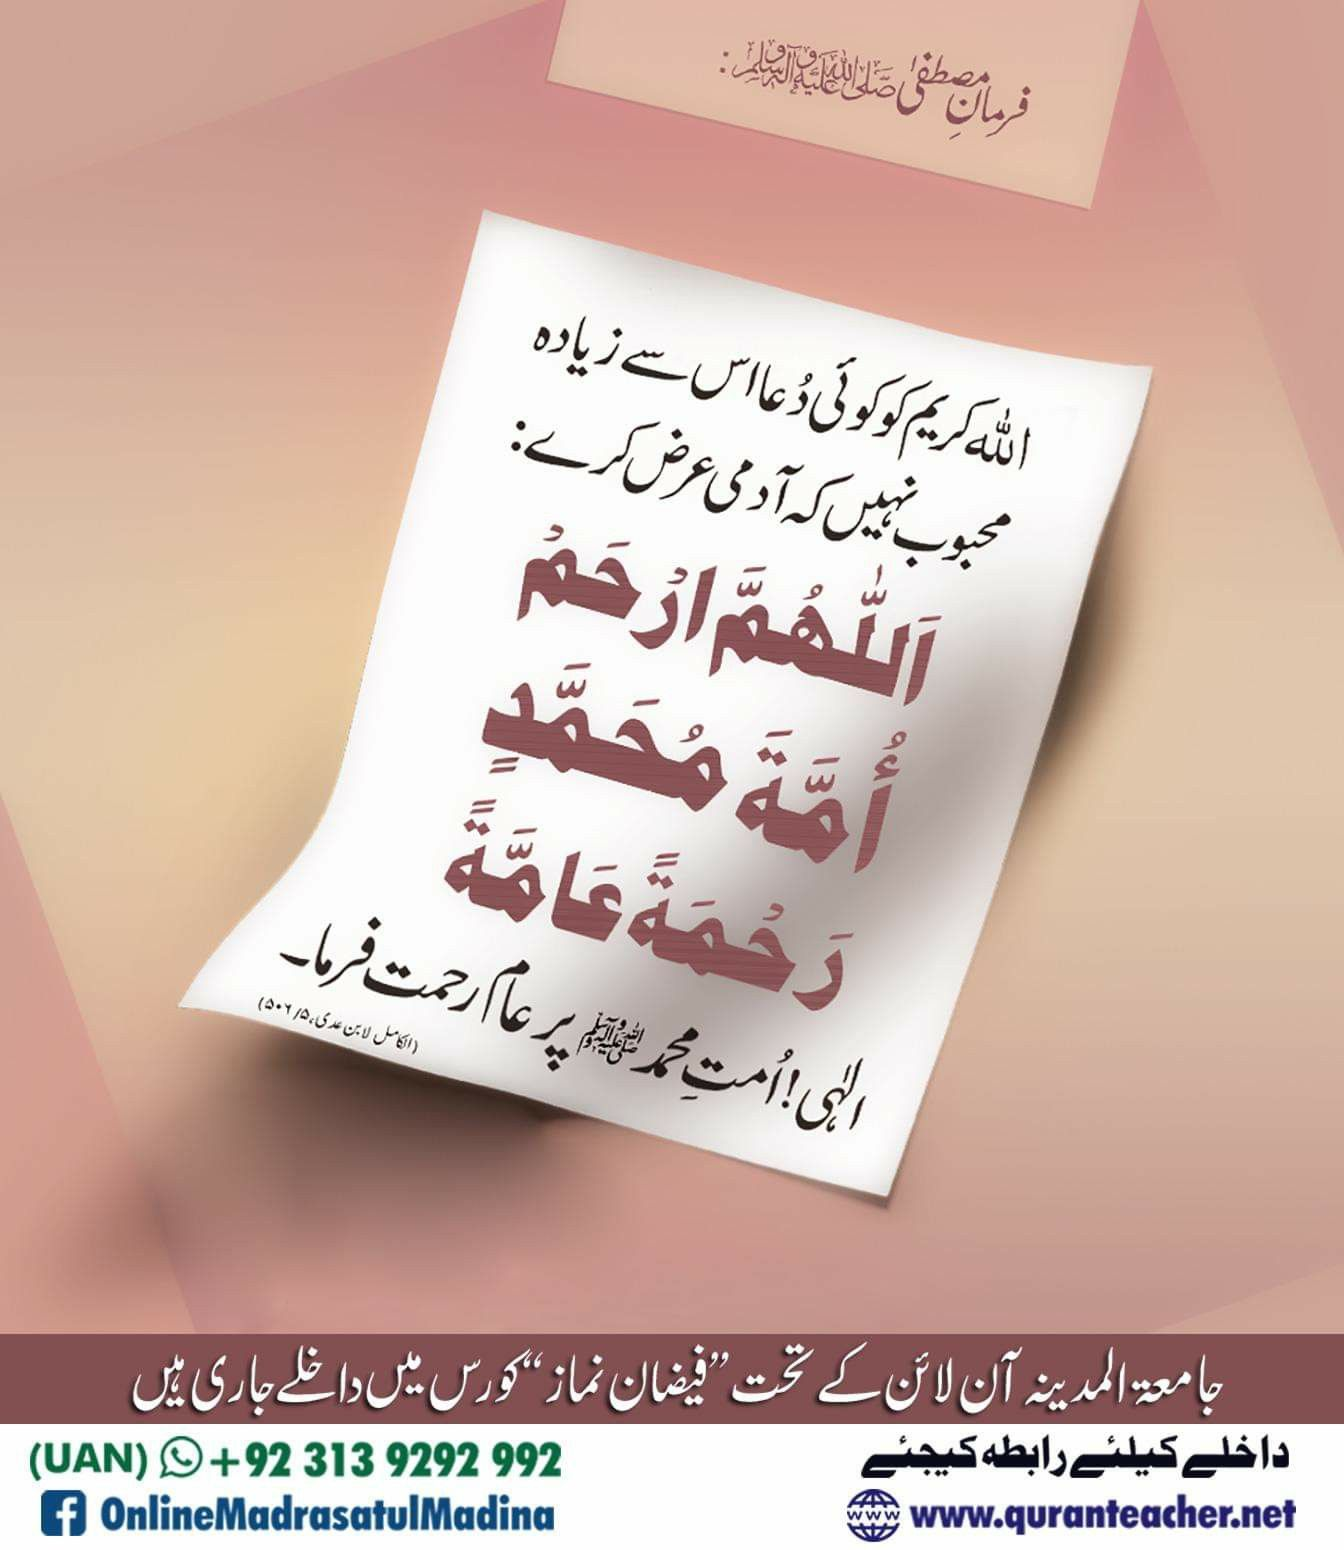 Pin By Samina Tariq On Islamic Dua In 2021 Book Cover Islamic Dua